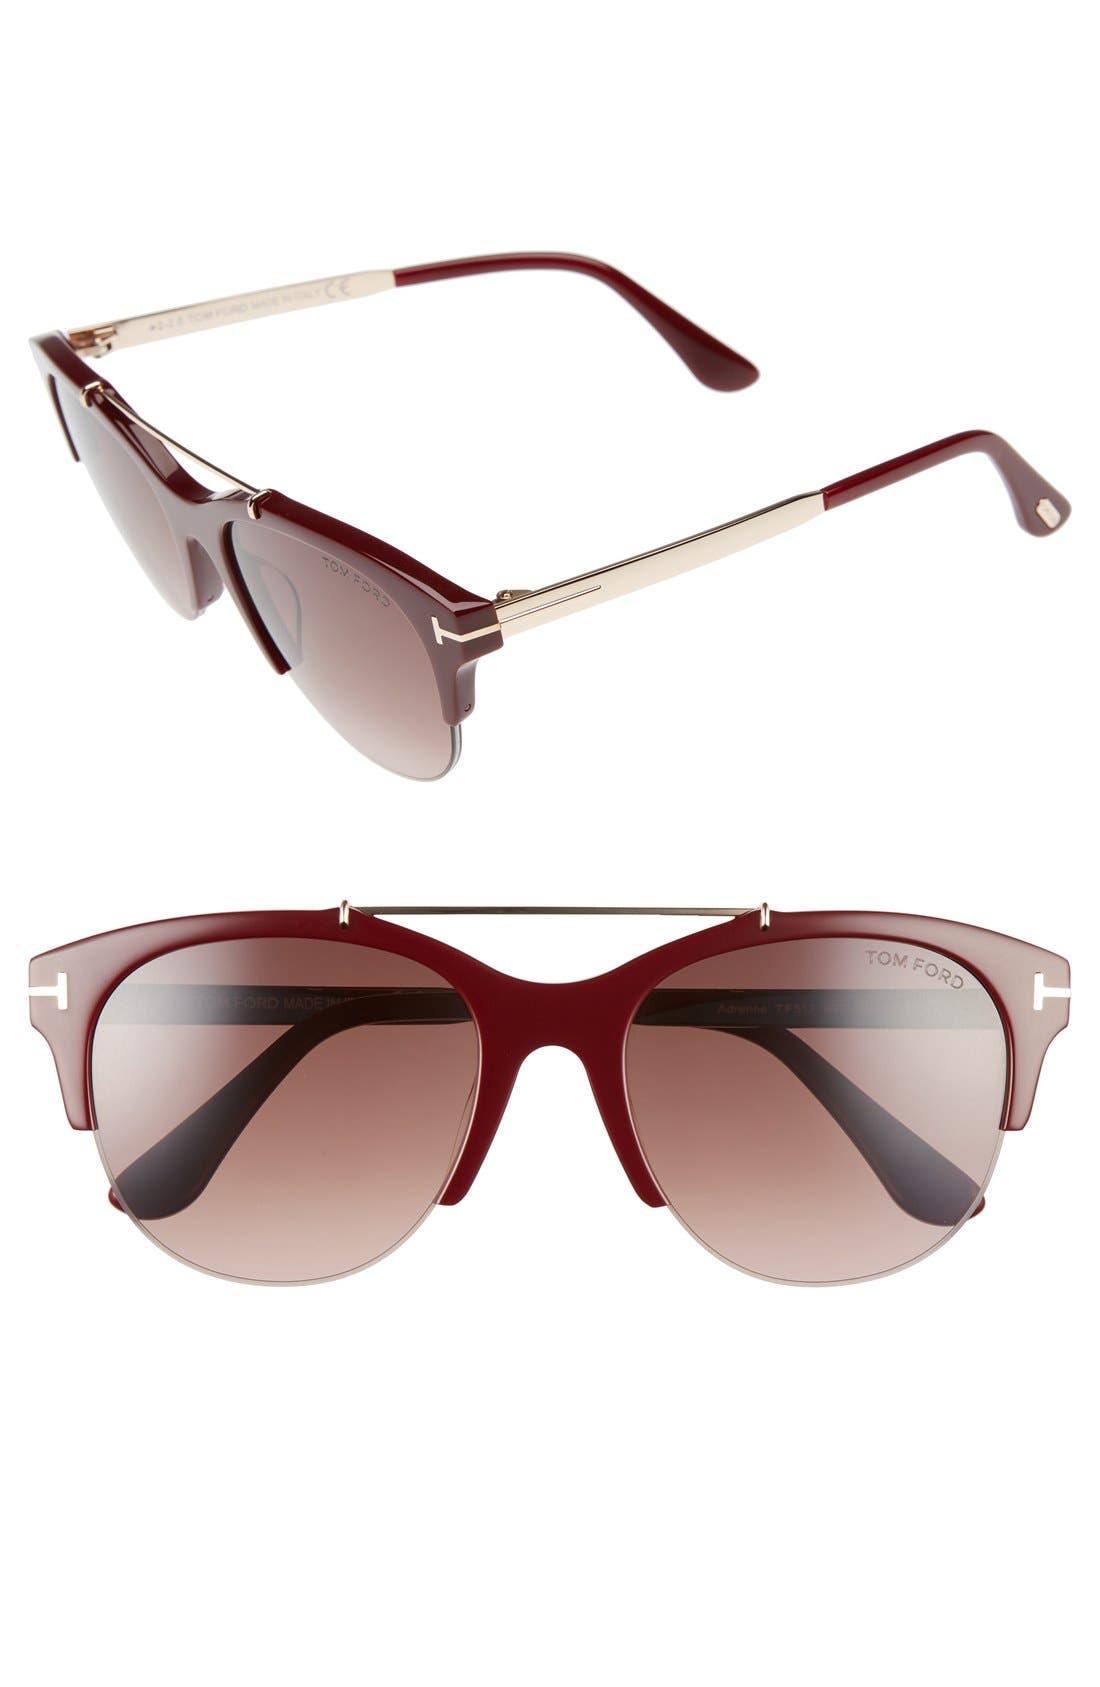 Tom Ford Adrenne 55mm Sunglasses